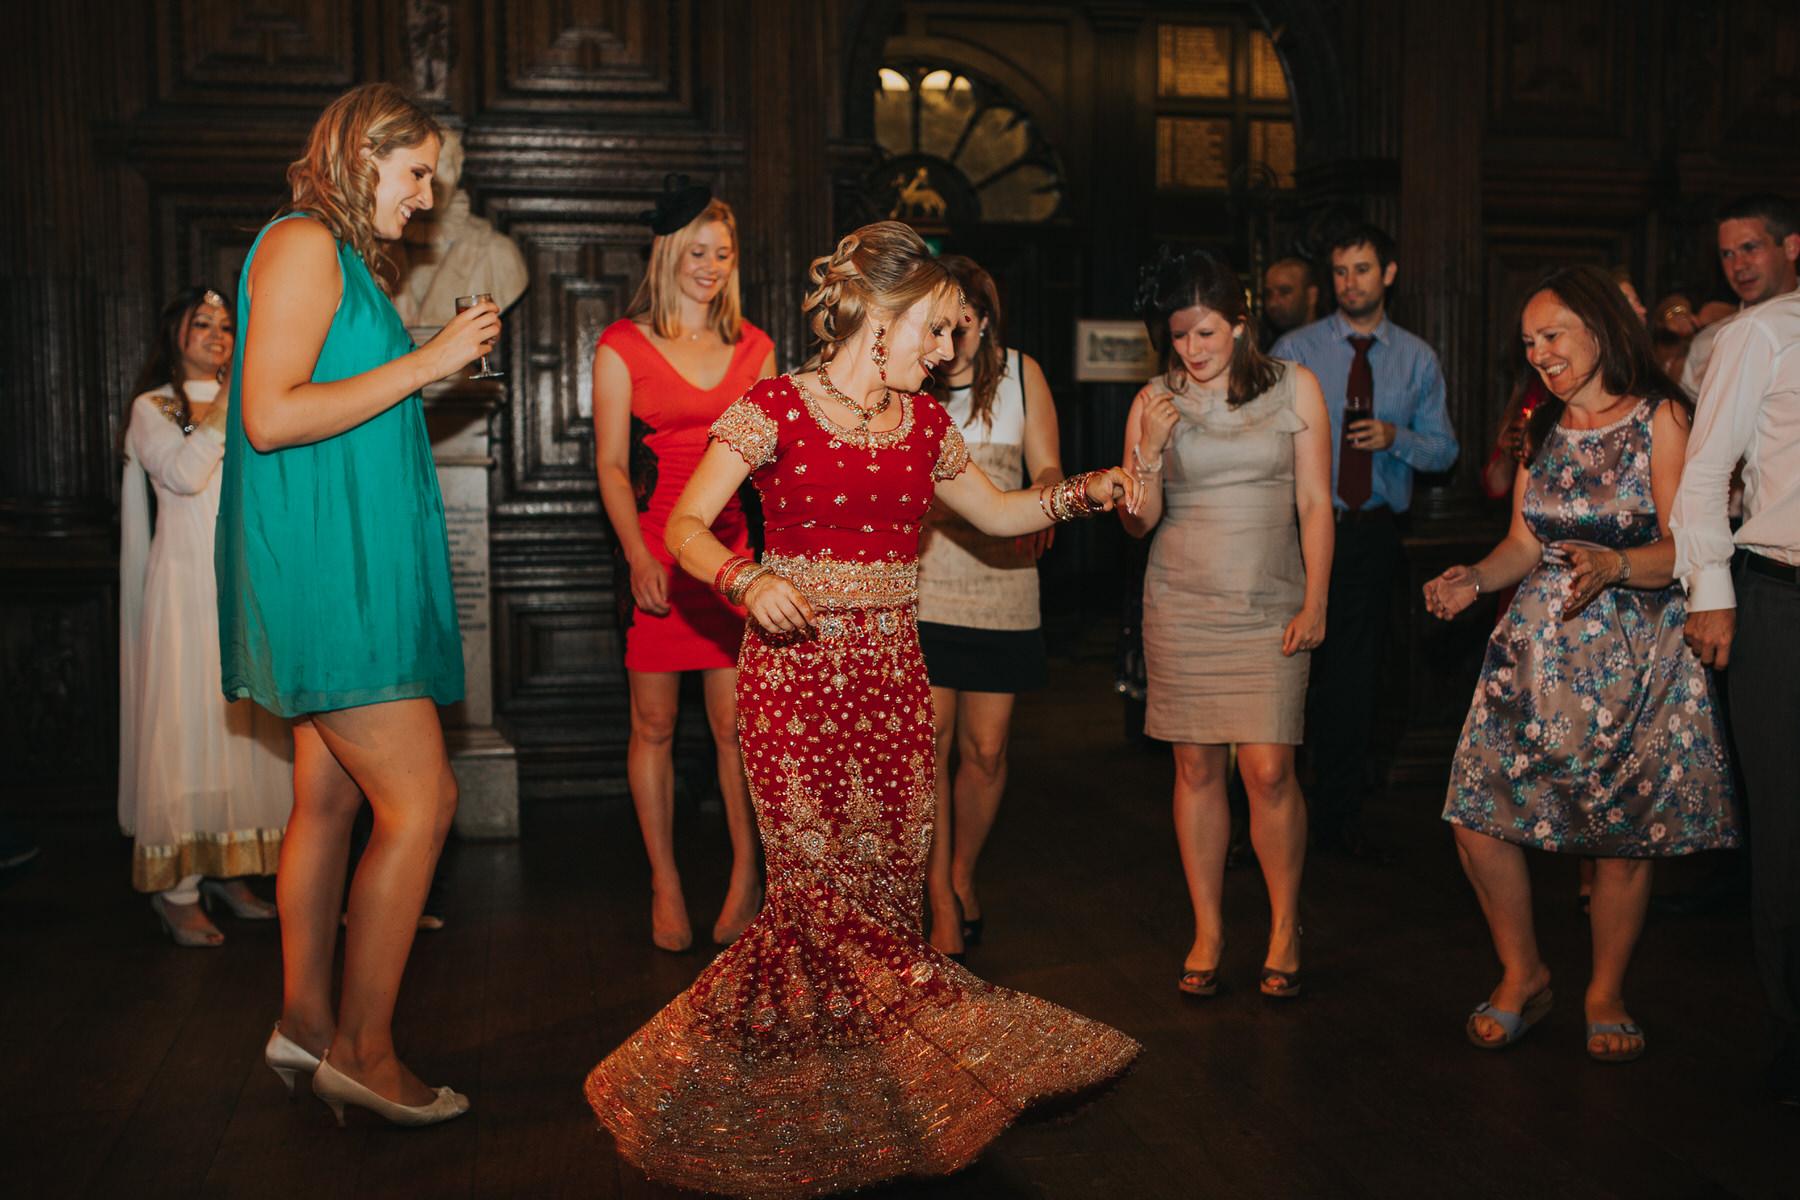 243-Anglo-Asian-London-Wedding-bride-dancing-red-sari.jpg